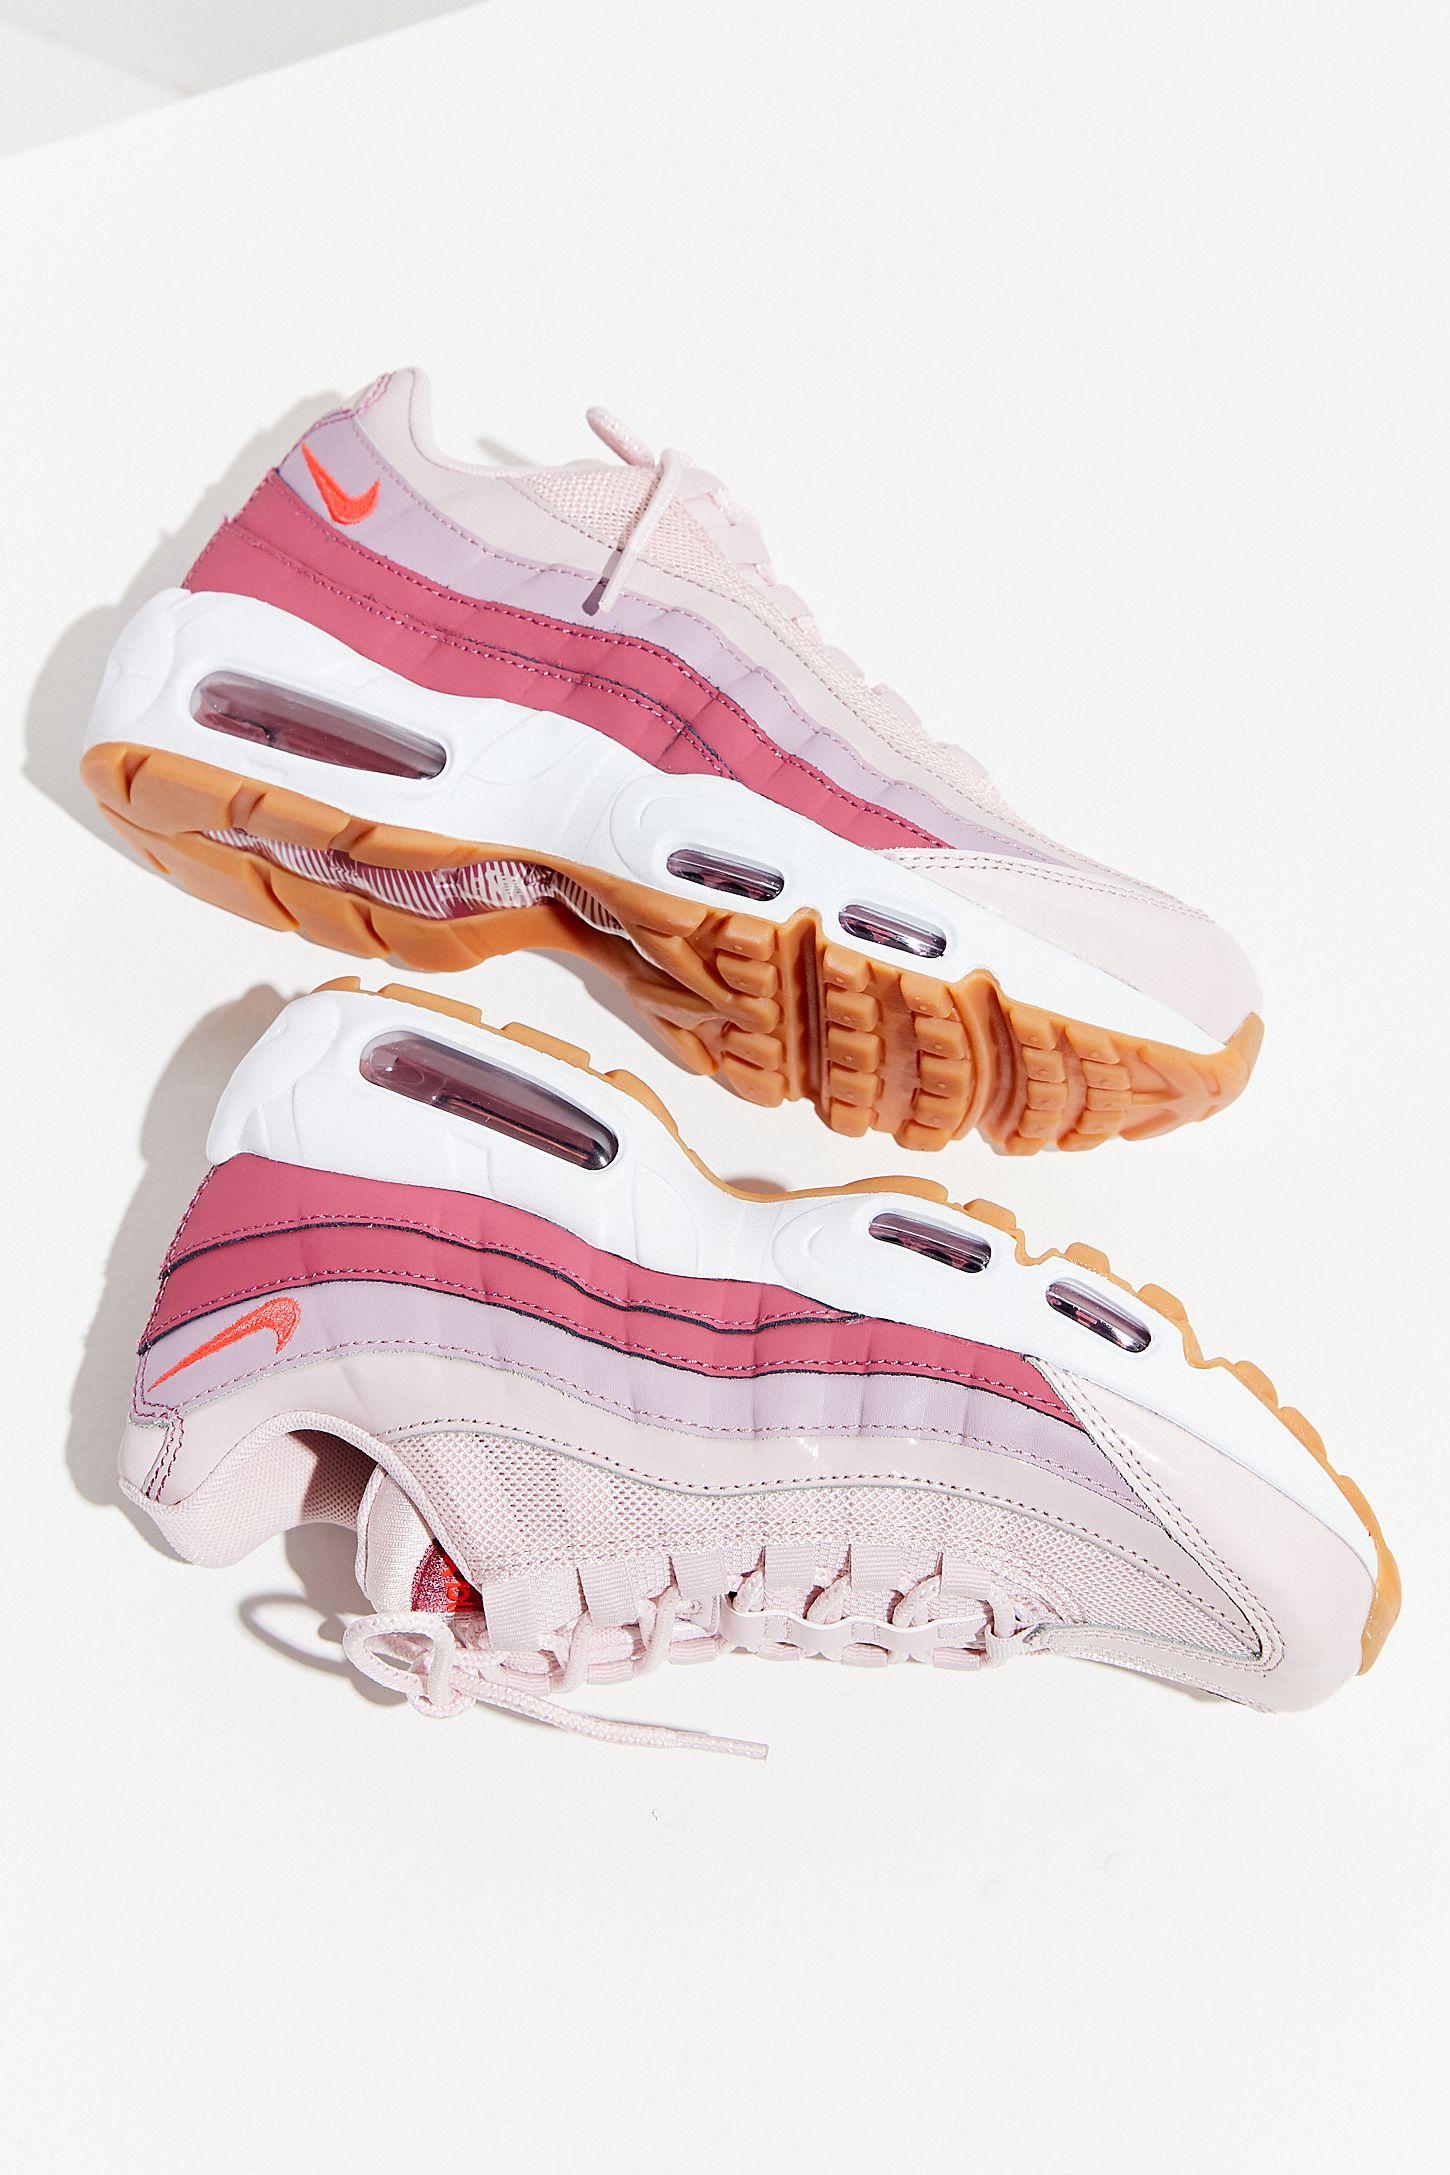 23218f9f69551 Nike Air Max 95 Sneaker